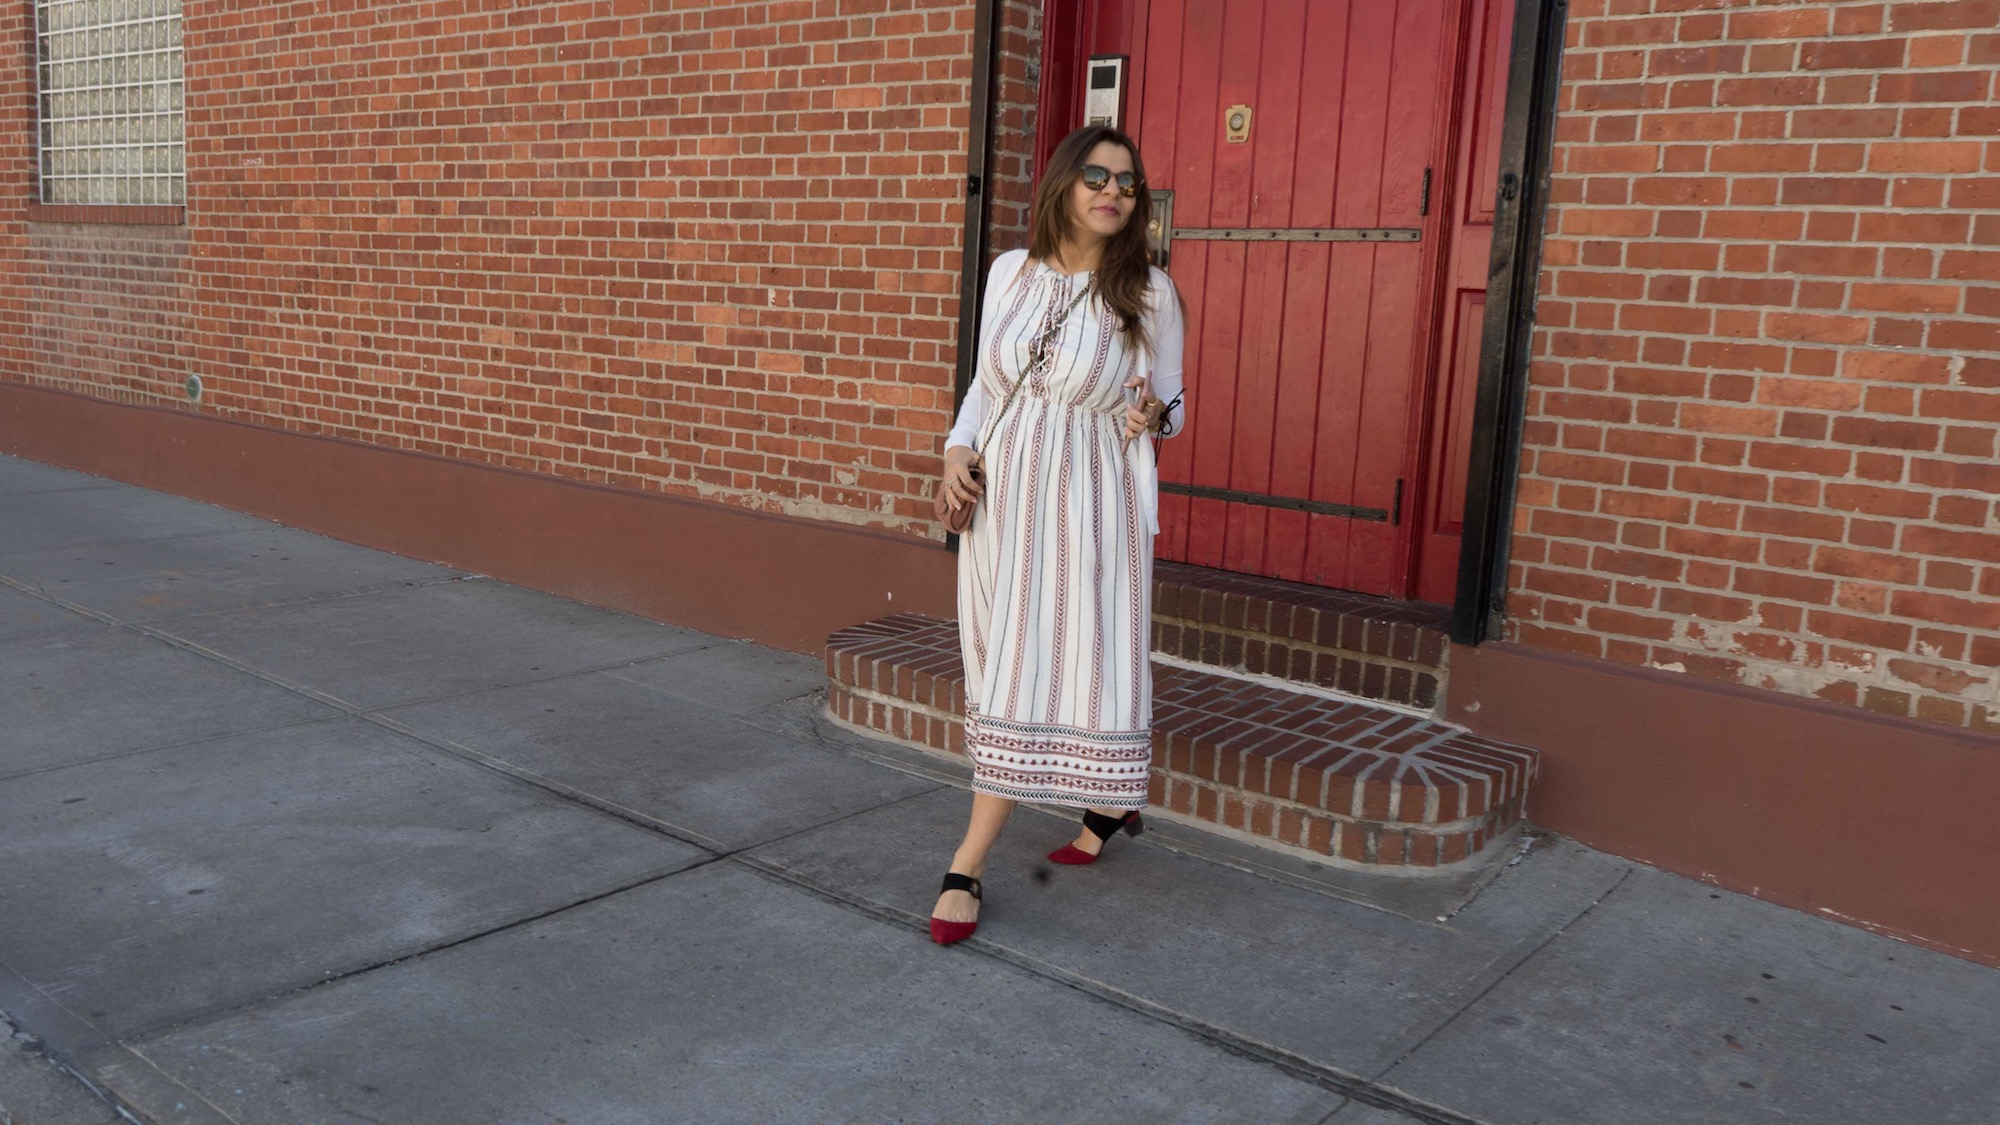 alley-girl-new-york-fashion-blogger-betul-yildiz-5